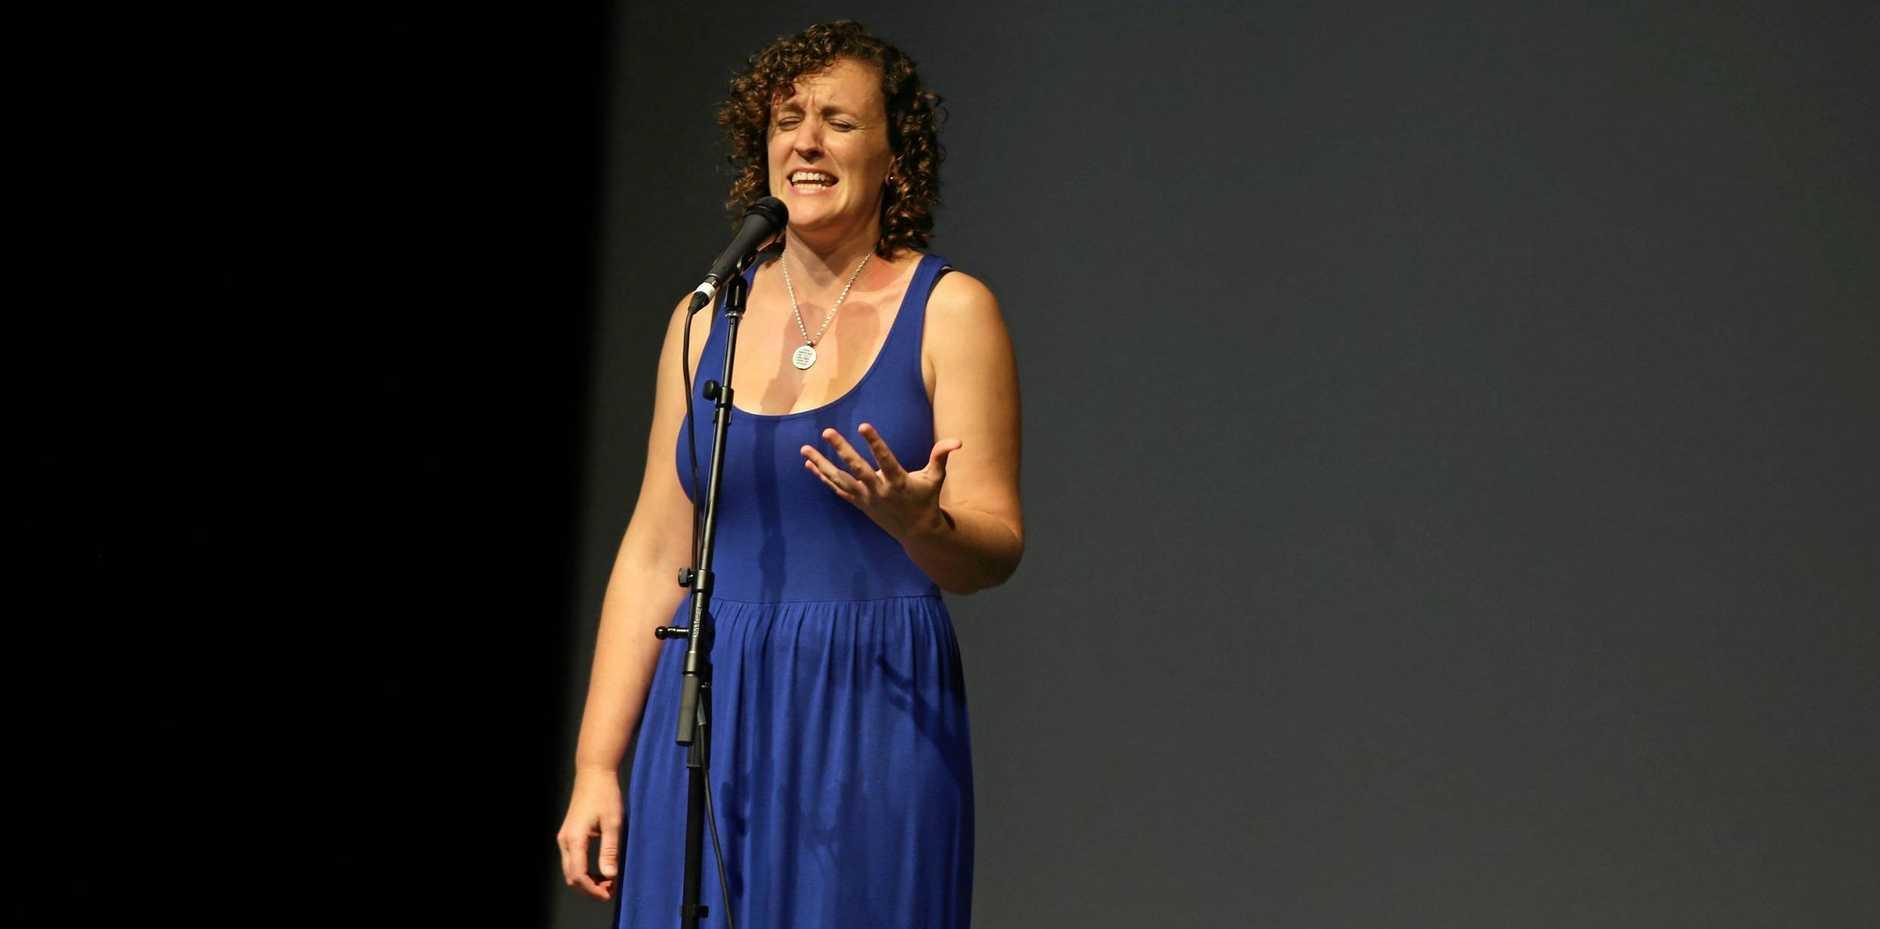 HOSTING WORKSHOP: Gabriella Salmon will help contestants fine-tune their act.